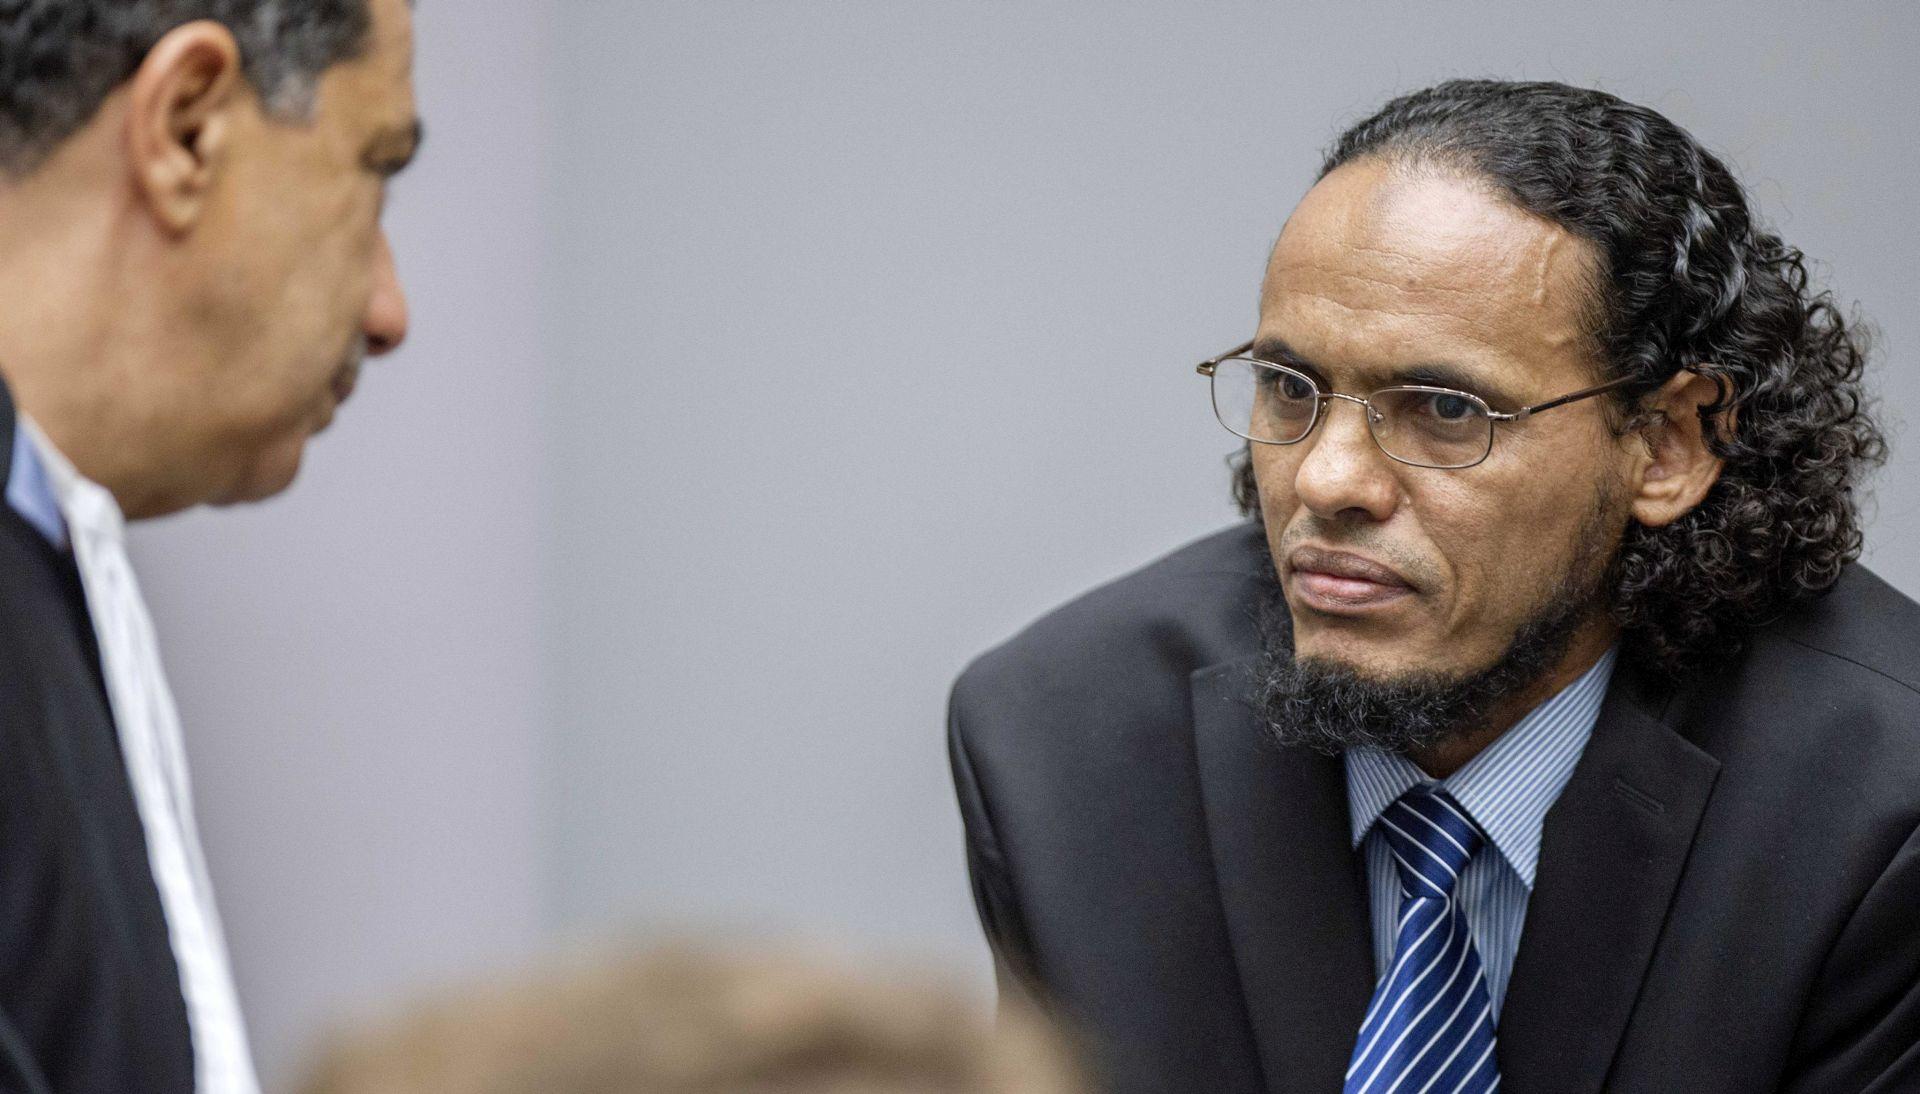 Islamist mora platiti 2,7 milijuna eura odštete zbog uništavanja svetišta u Timbuktuu